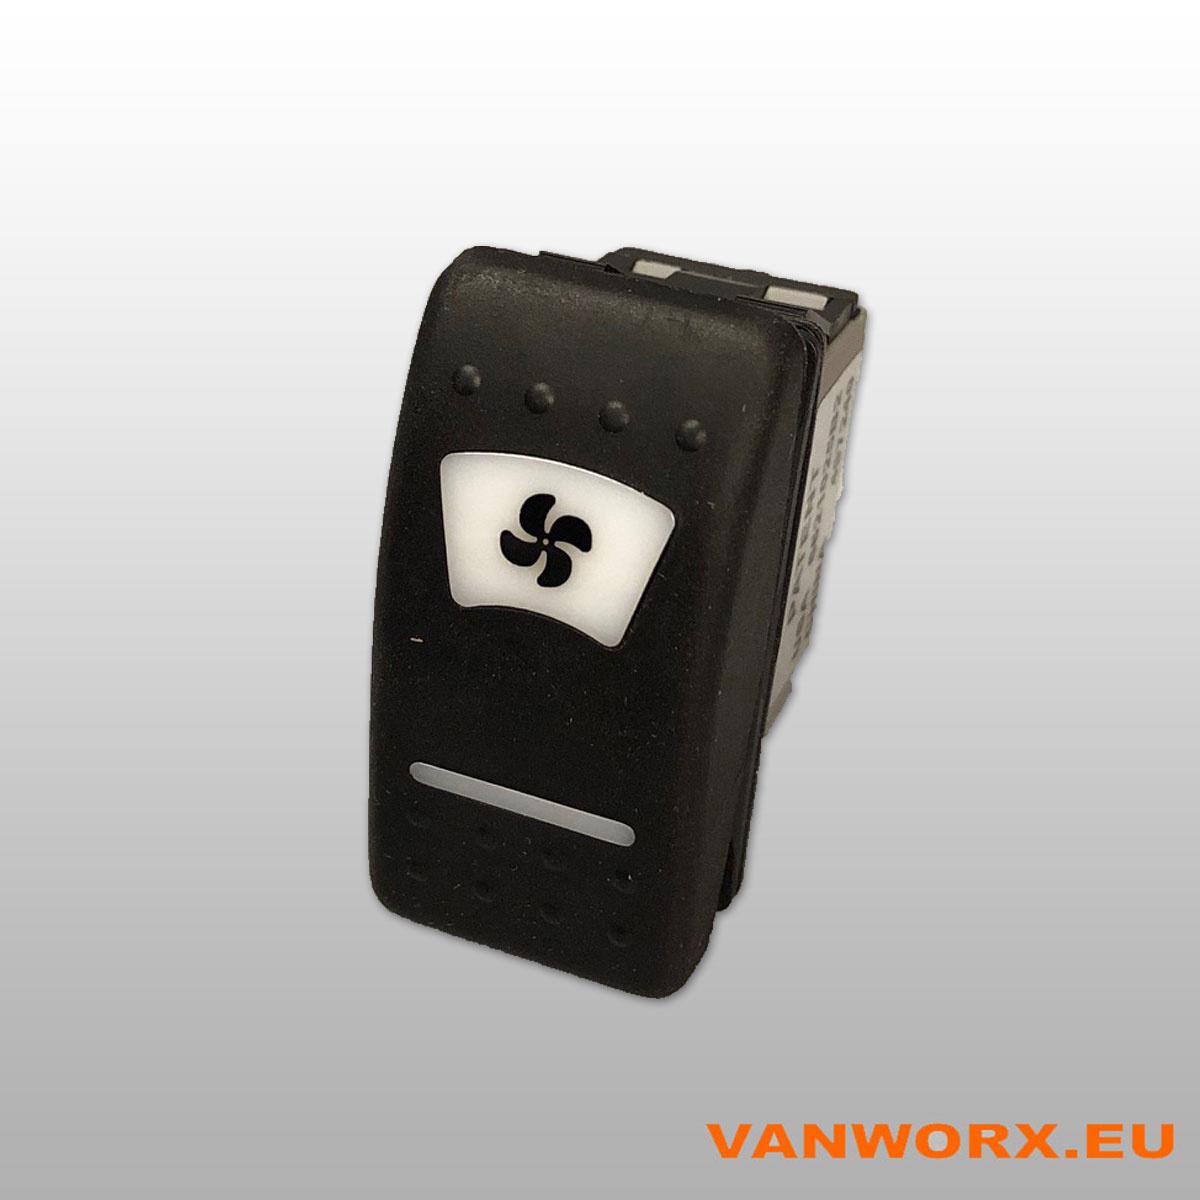 3 step switch with symbol